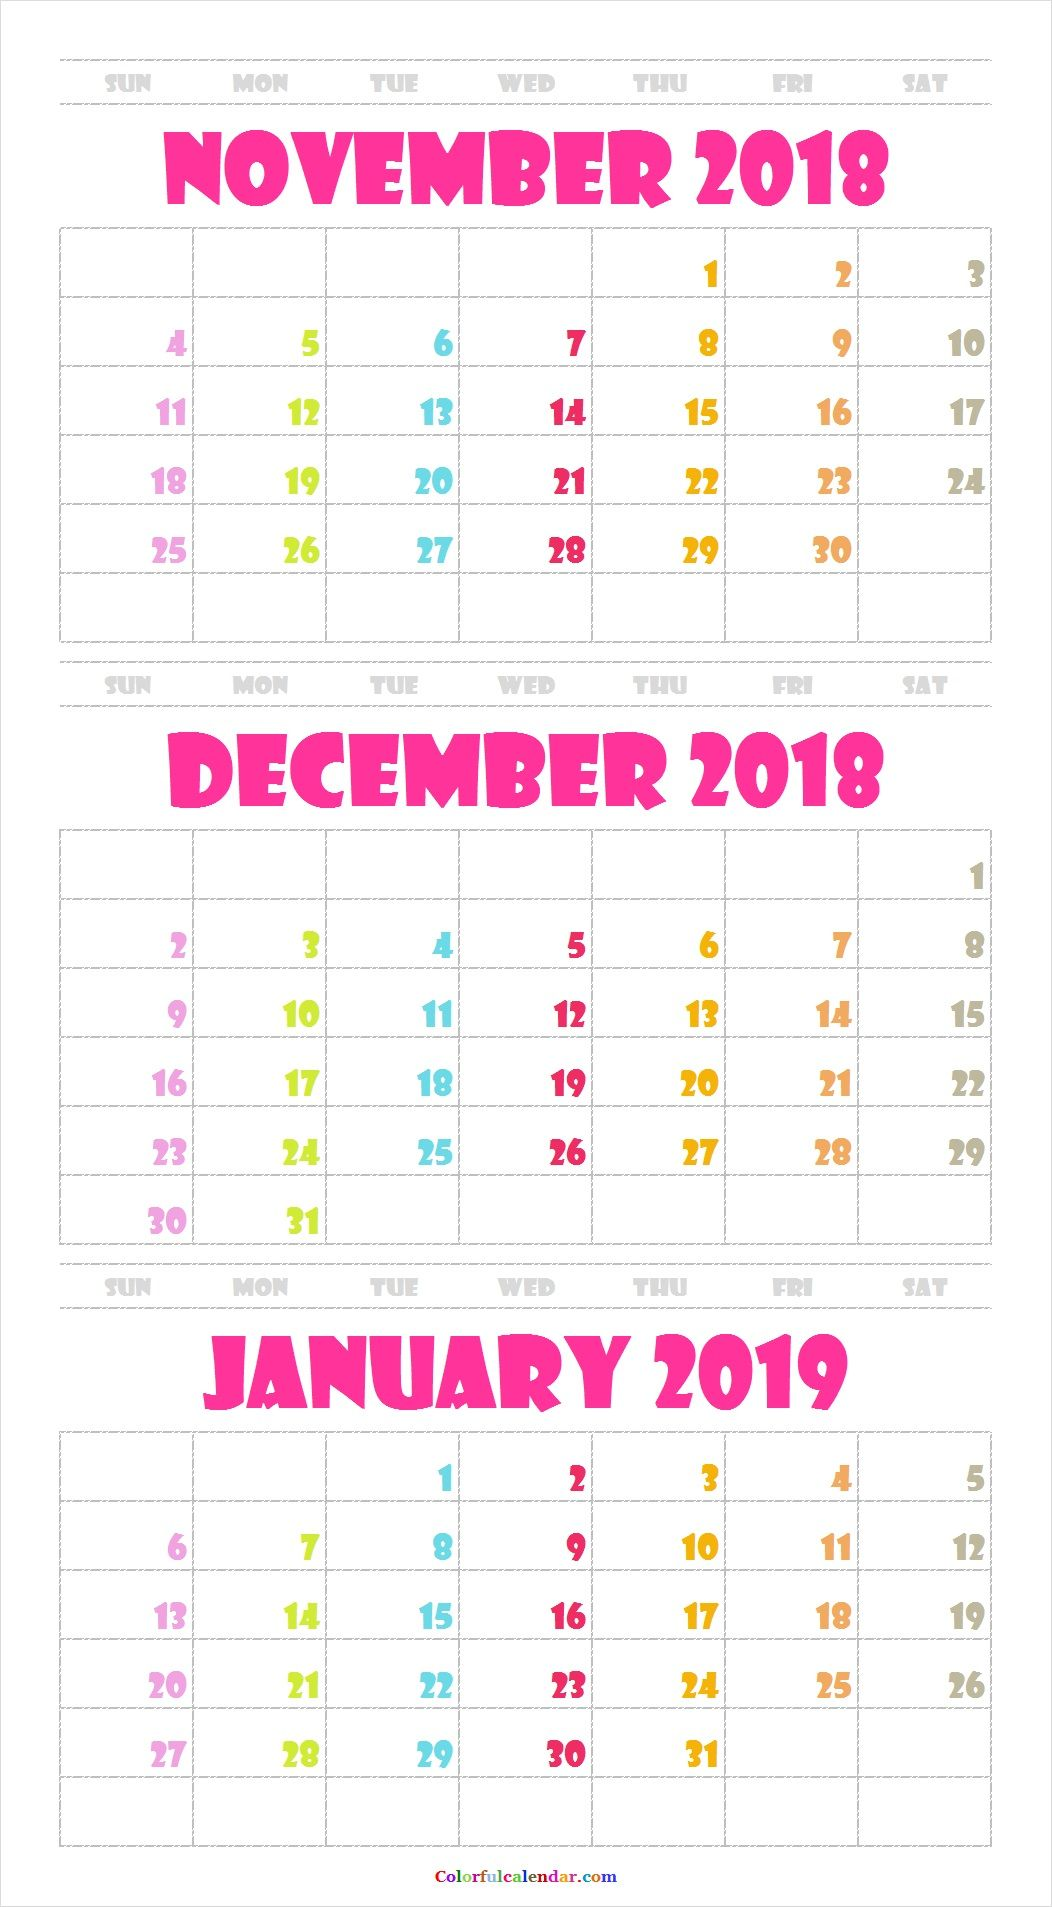 Cute November December 2018 January 2019 Calendar Printable